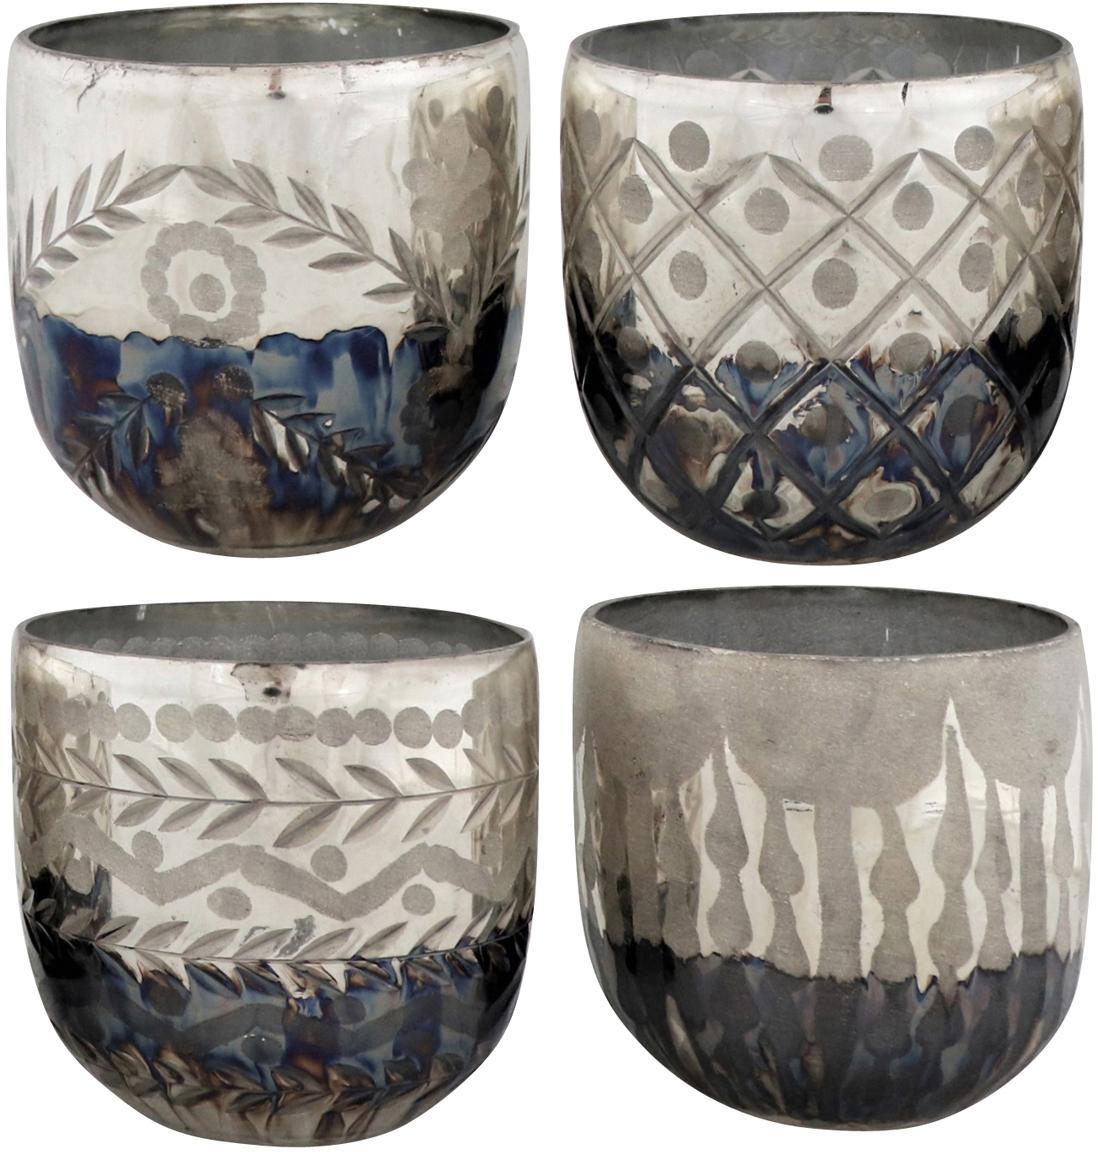 Windlichtenset Excelsior, 4-delig, Glas, Zilverkleurig, antraciet, Ø 10 x H 9 cm